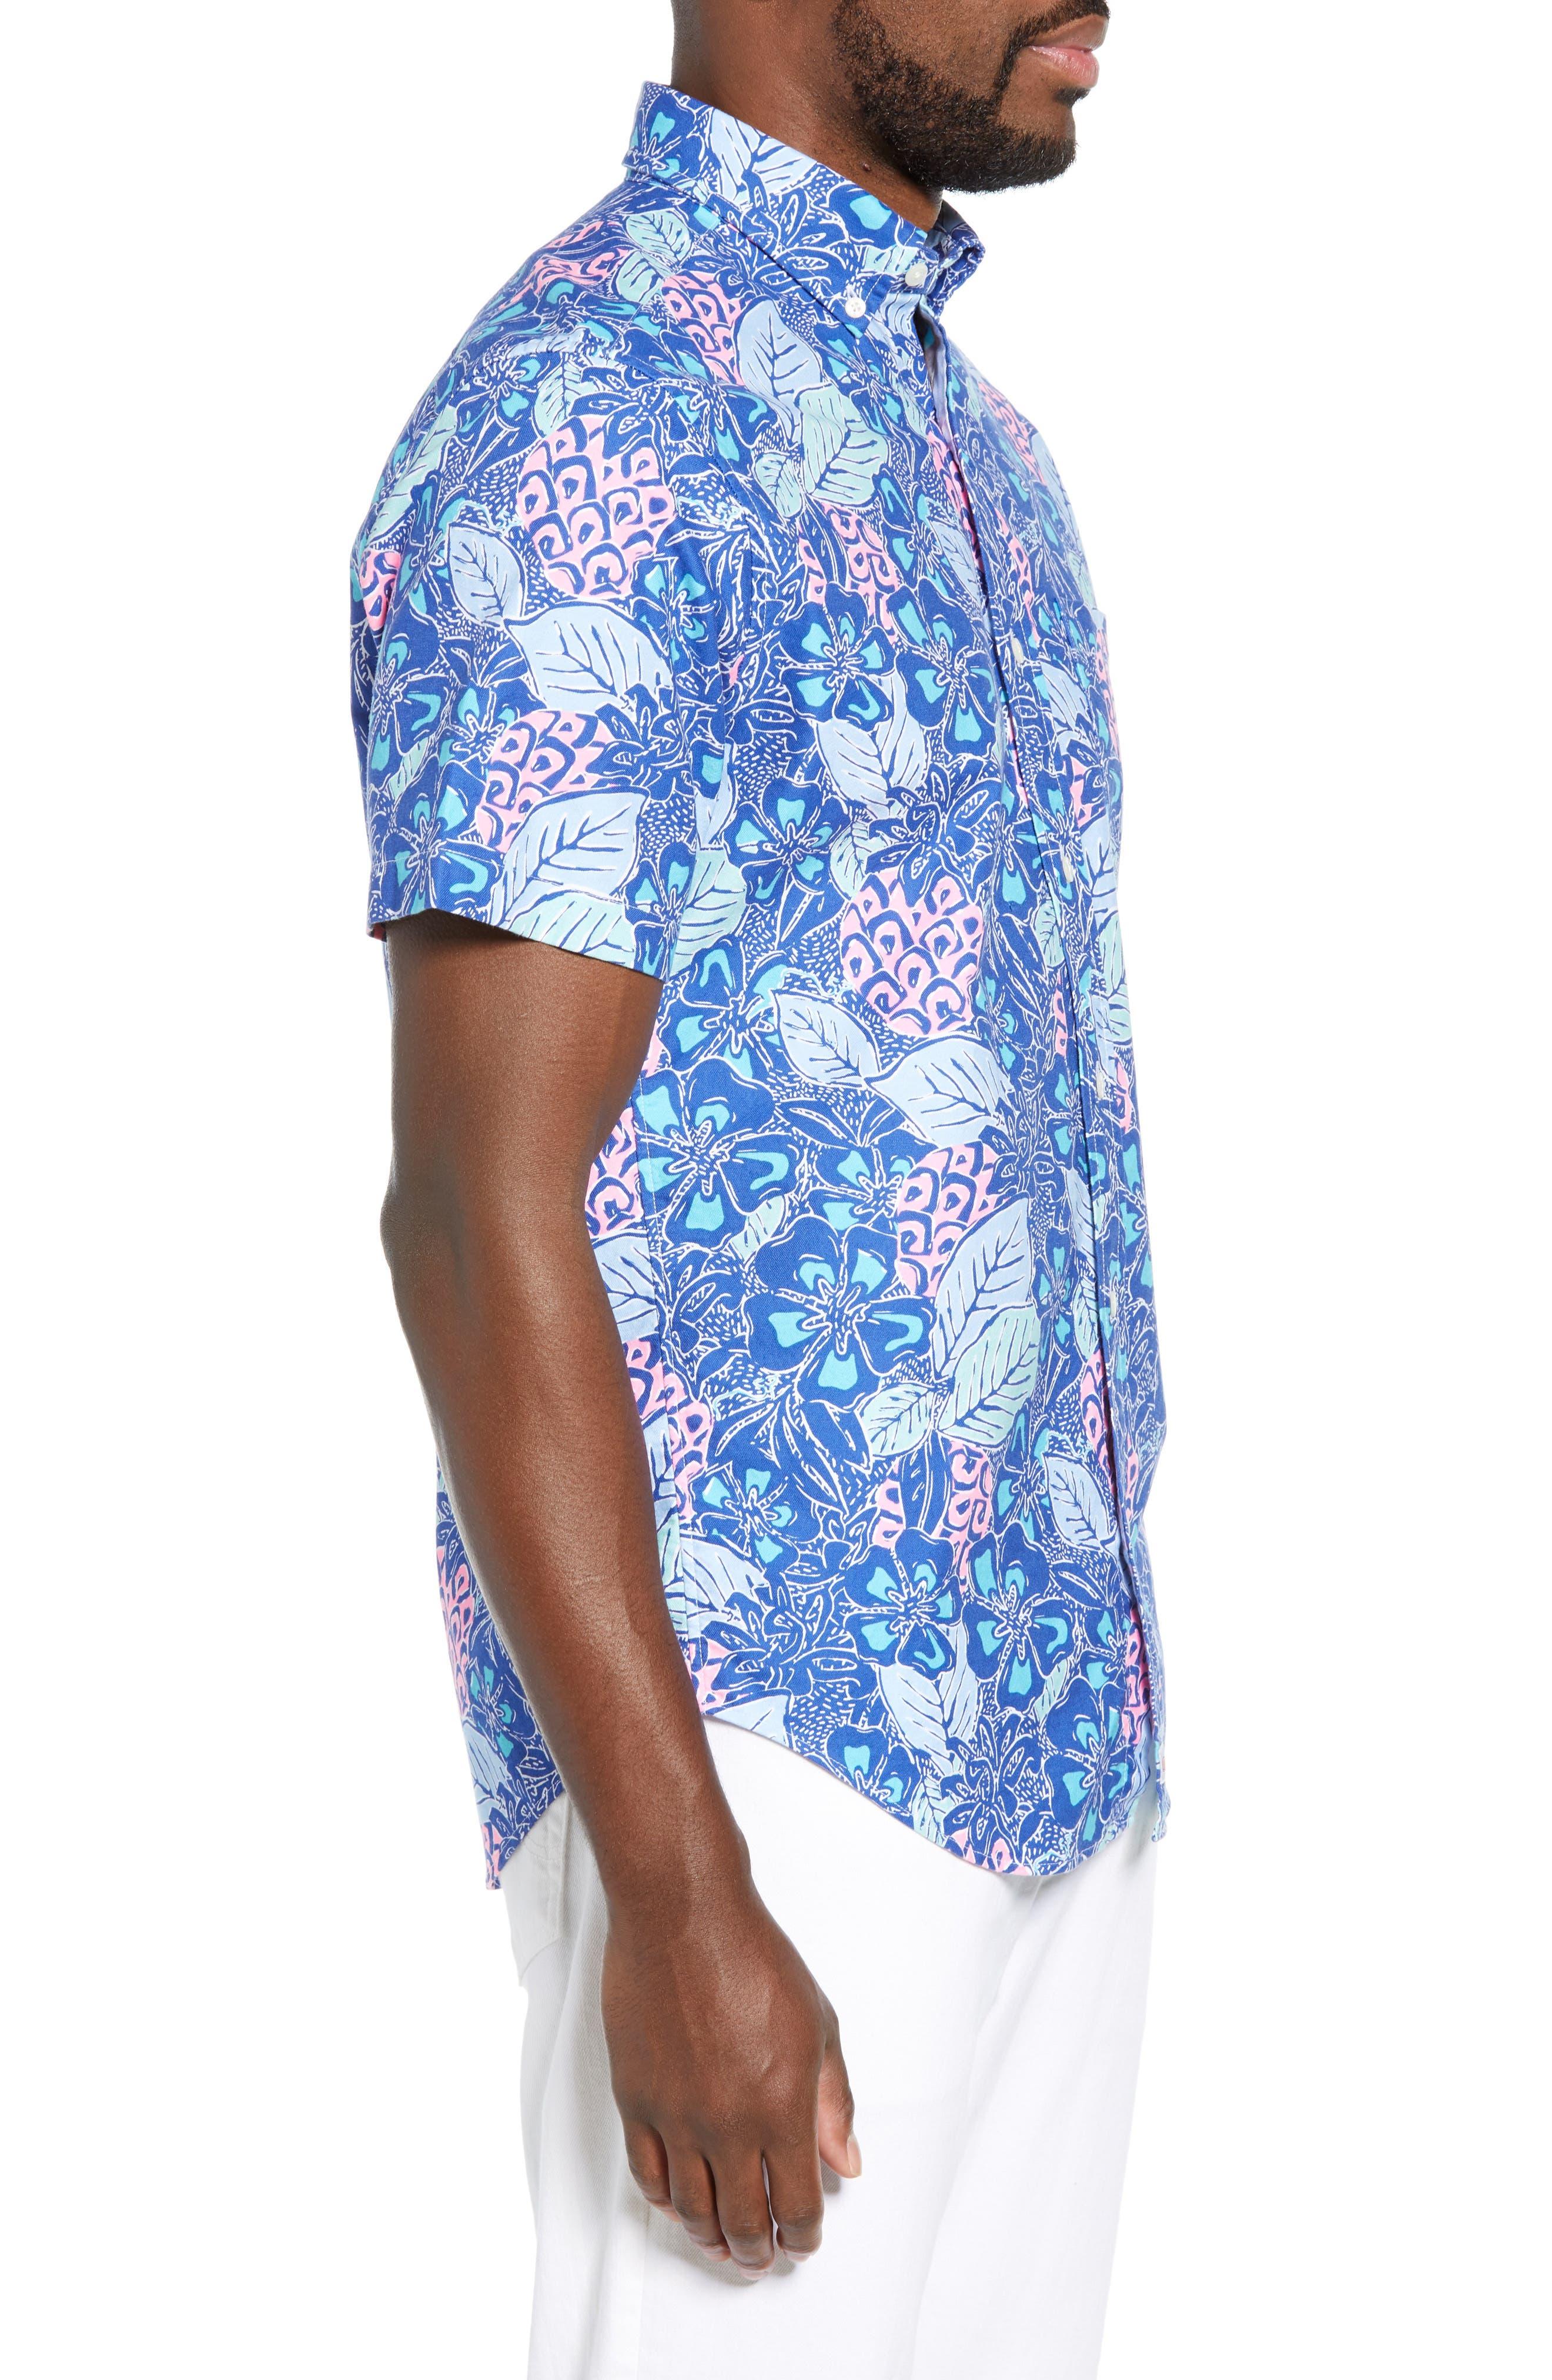 VINEYARD VINES,                             Murray Slim Fit Pineapple Print Sport Shirt,                             Alternate thumbnail 4, color,                             ROYAL OCEAN